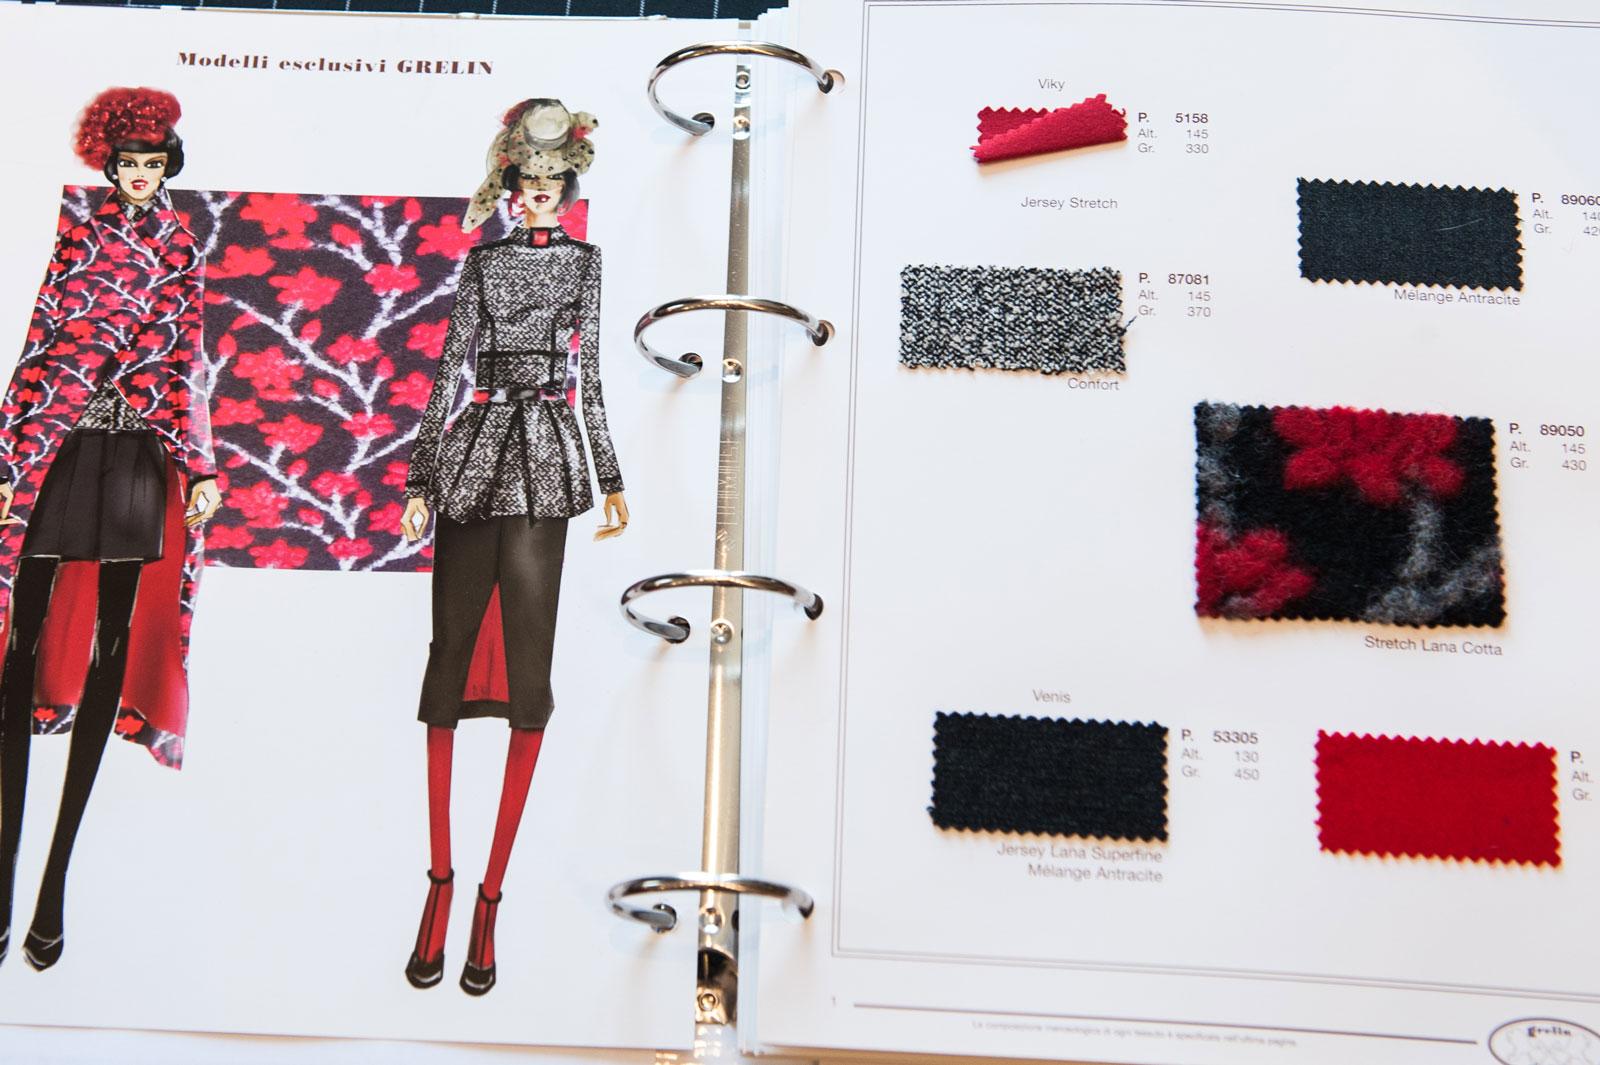 daniels-custom-clothing-minneapolis-169